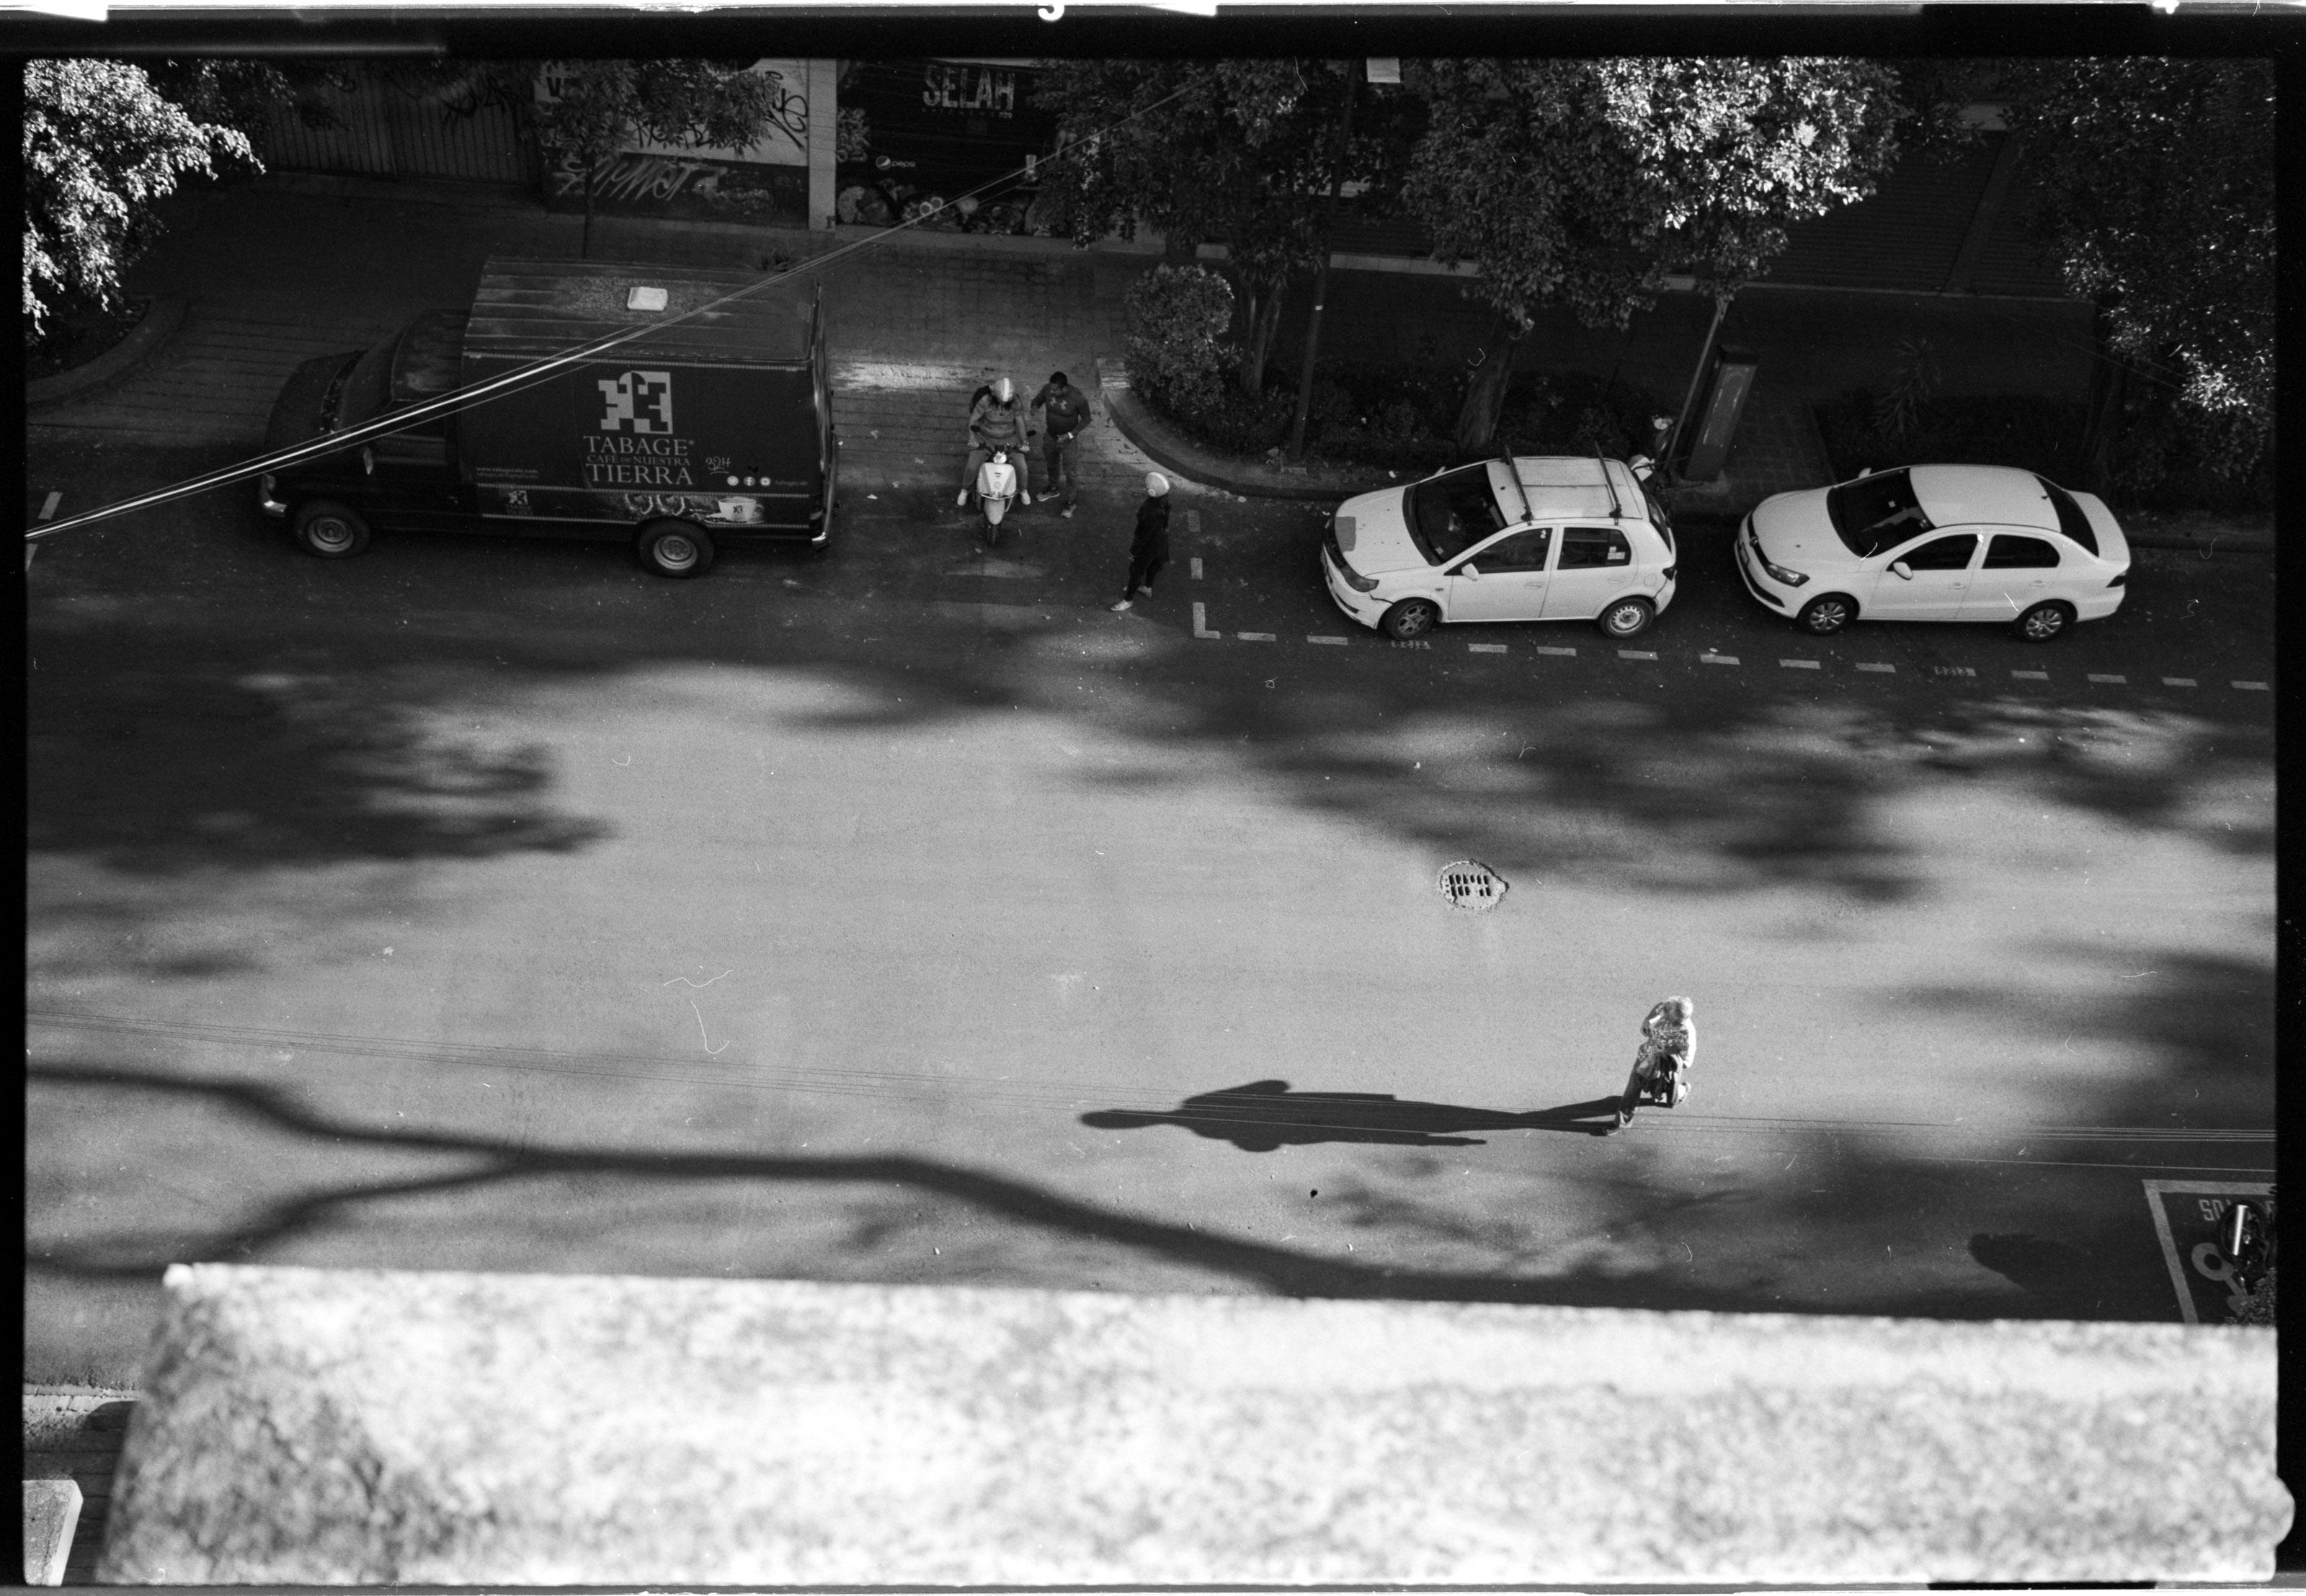 ilford hp5 plus shot by Luis Mendoza on Fuji GW690ii